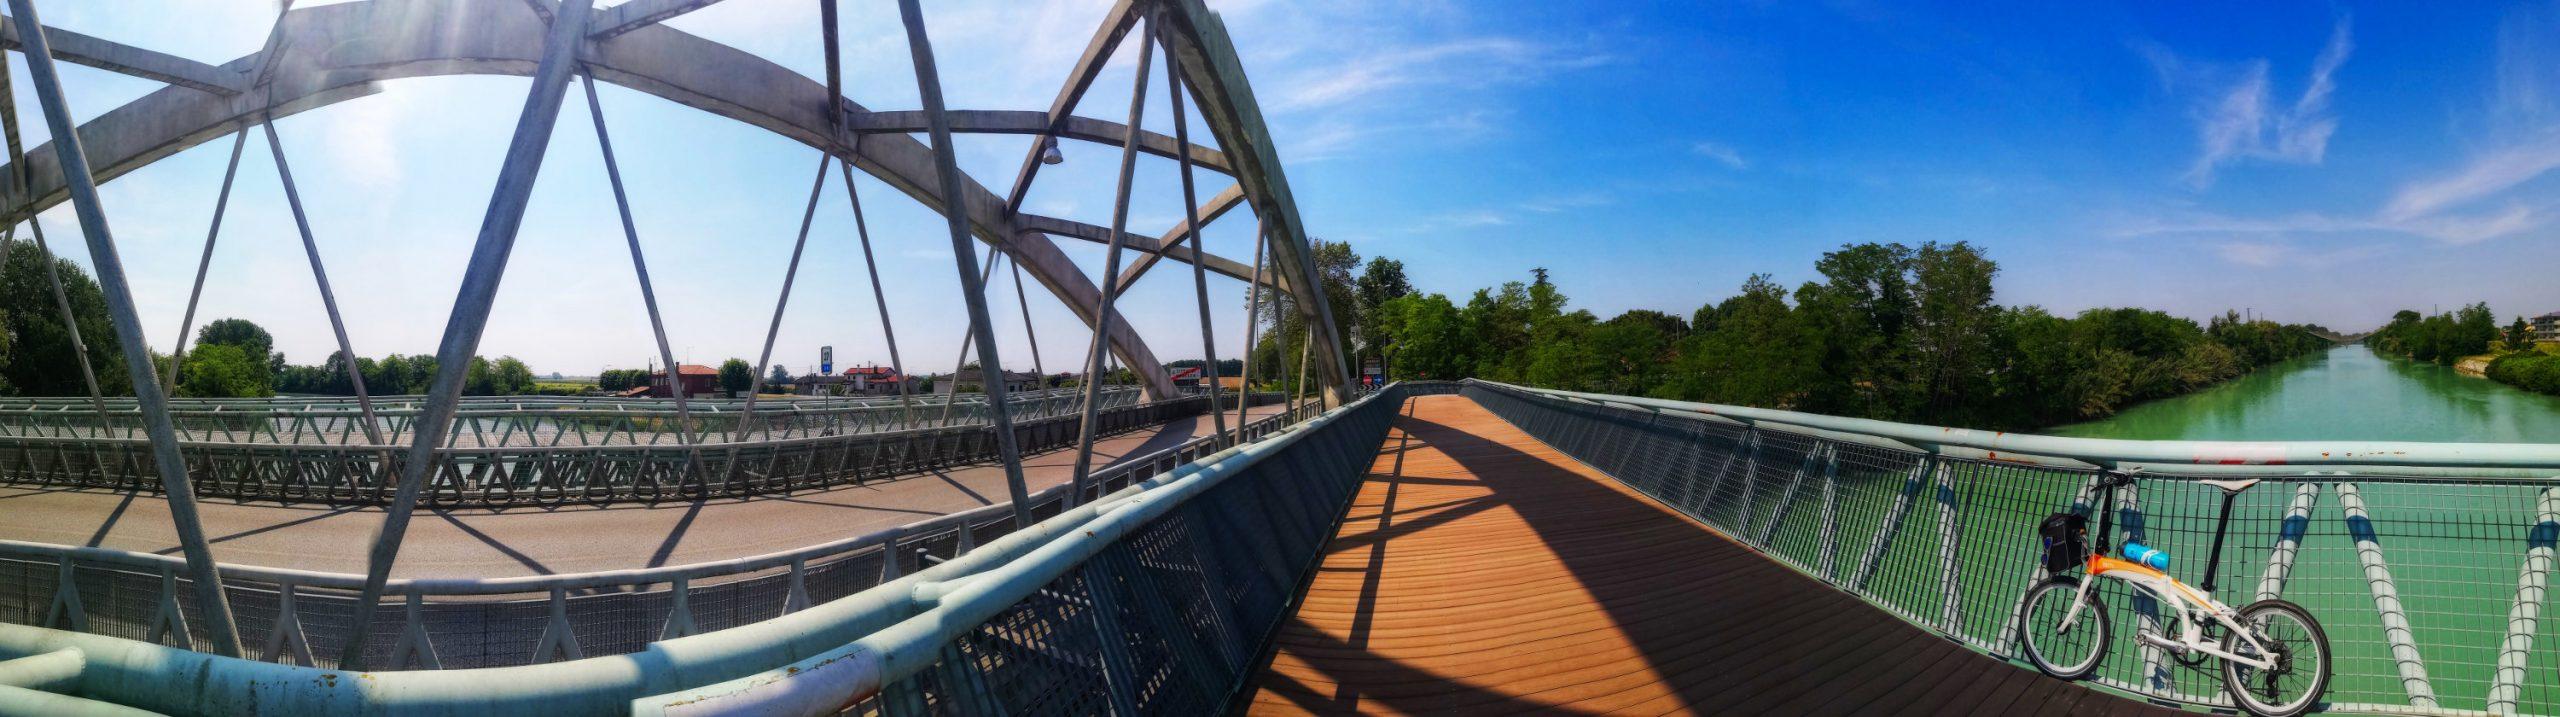 Caorle 2021 - Brückenpanorama Eraclea mit Klapprad